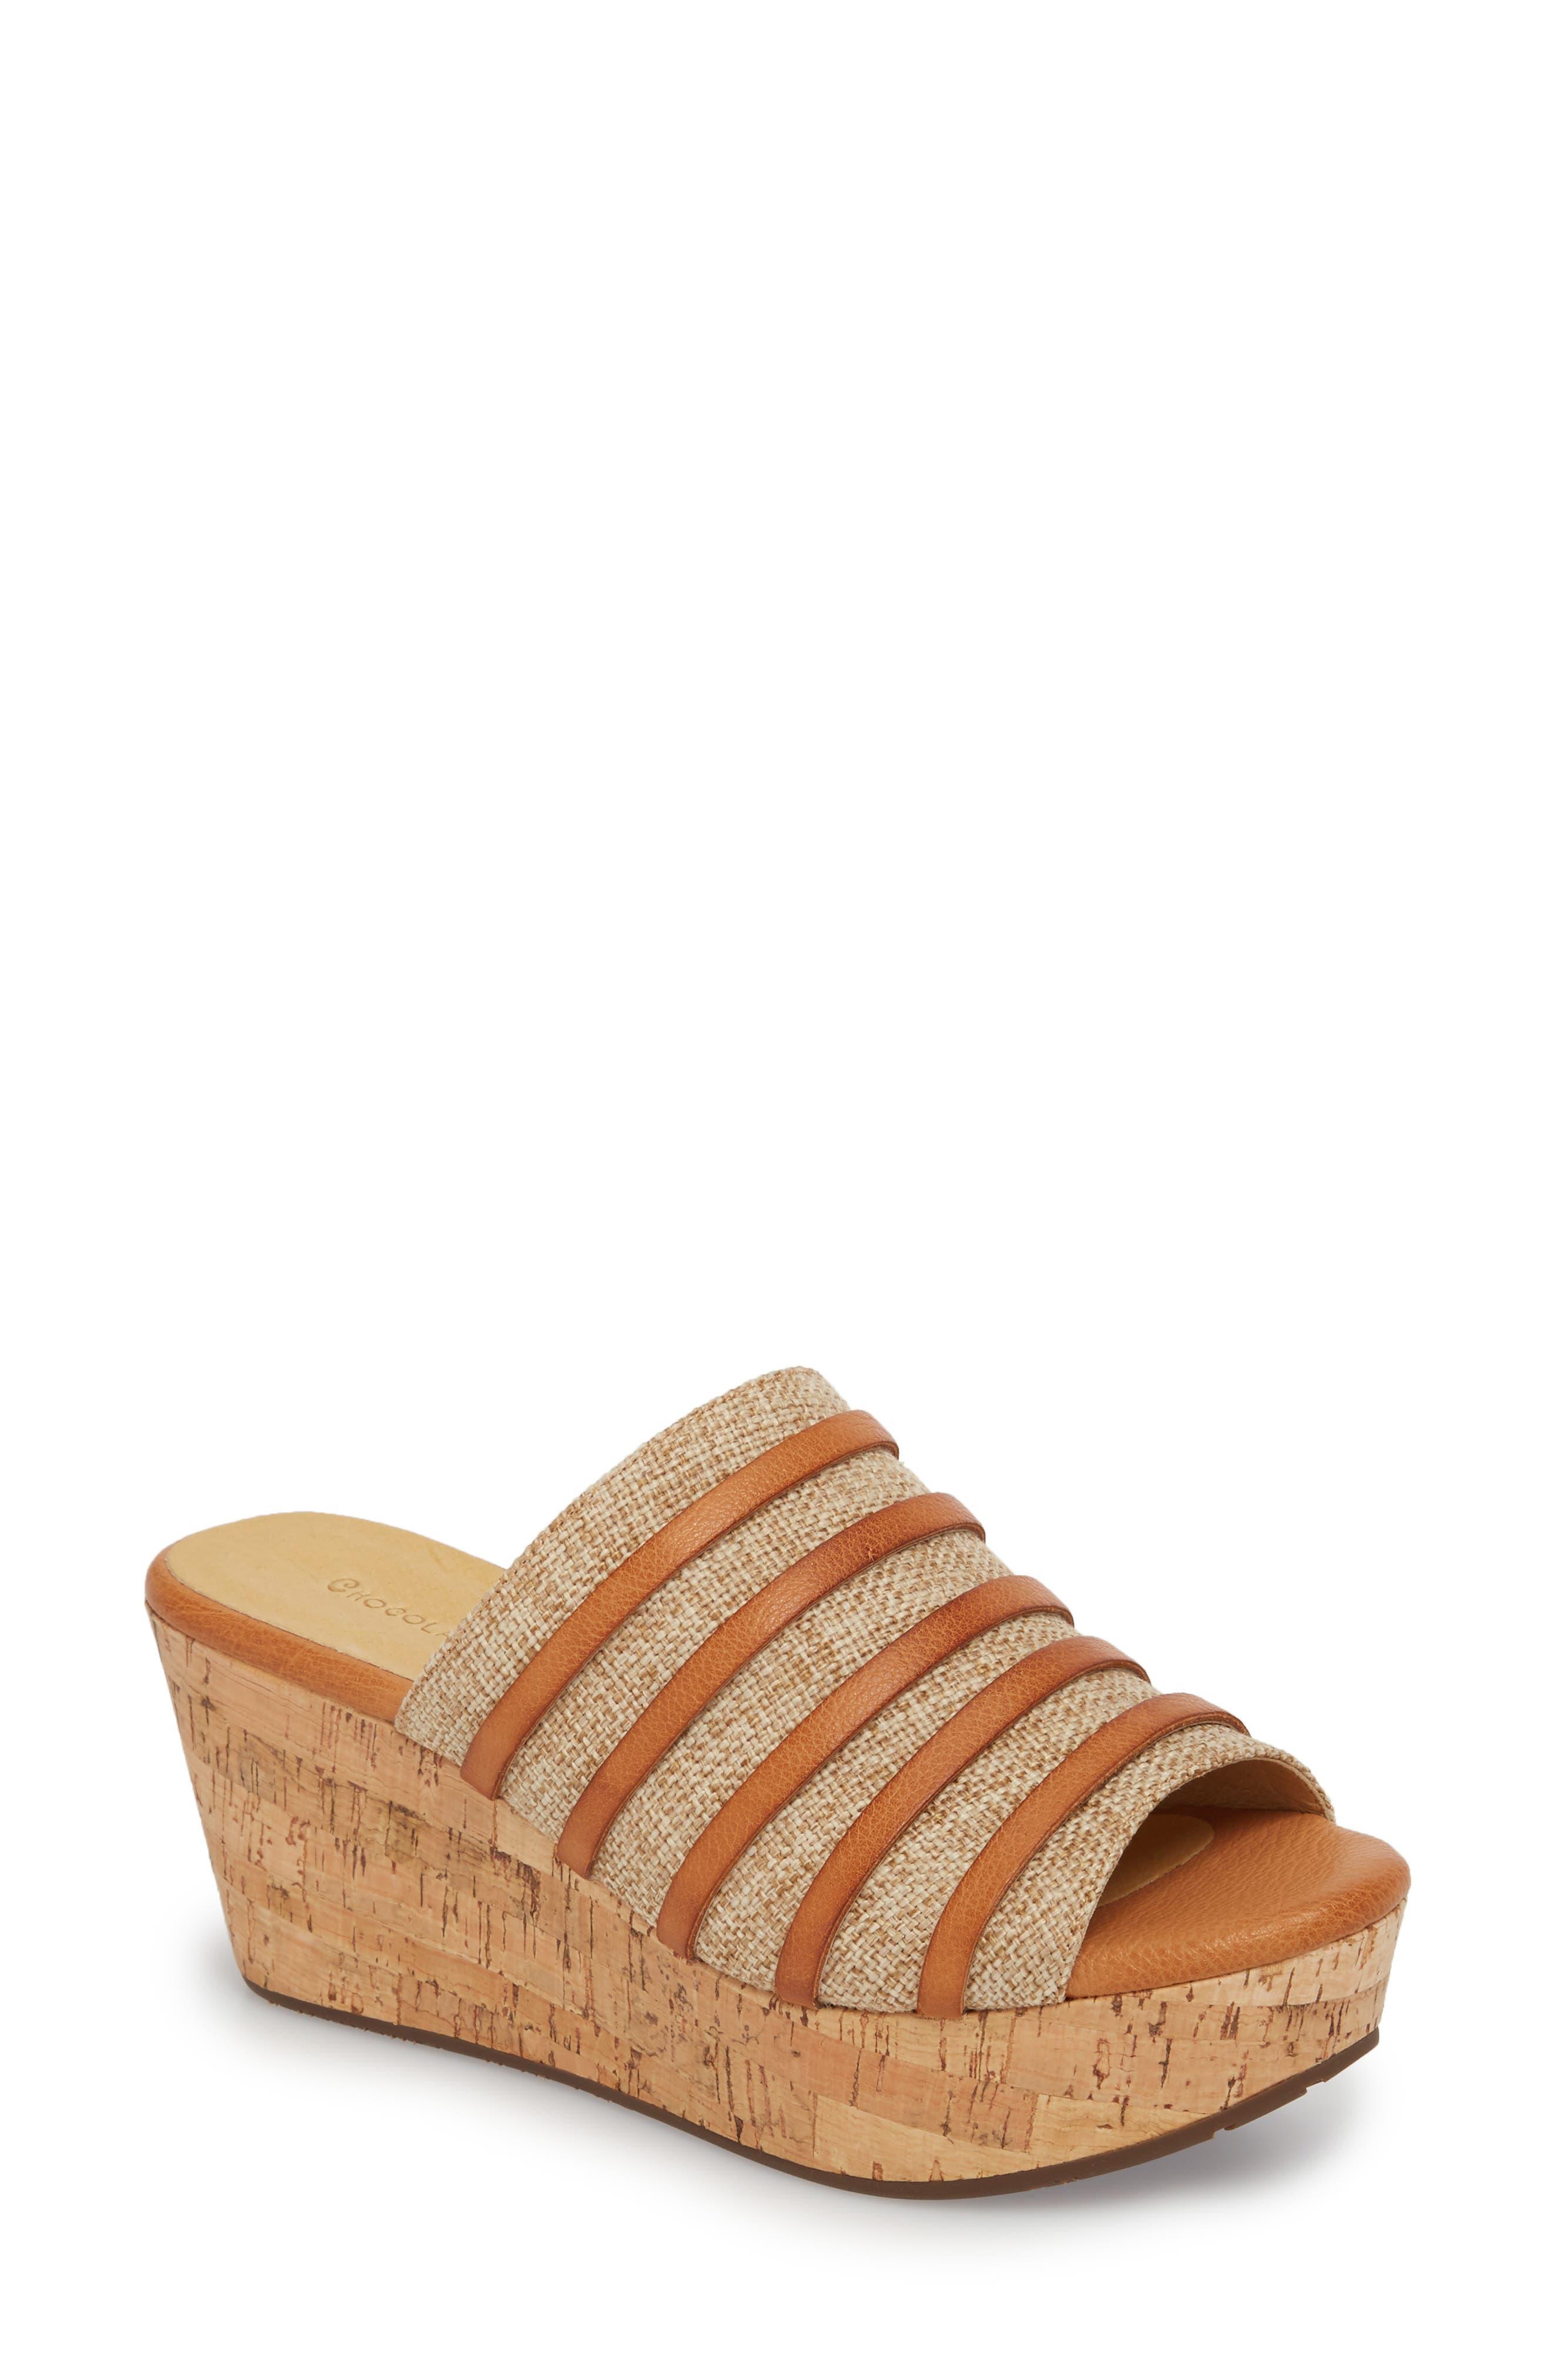 Wapi Wedge Sandal,                             Main thumbnail 1, color,